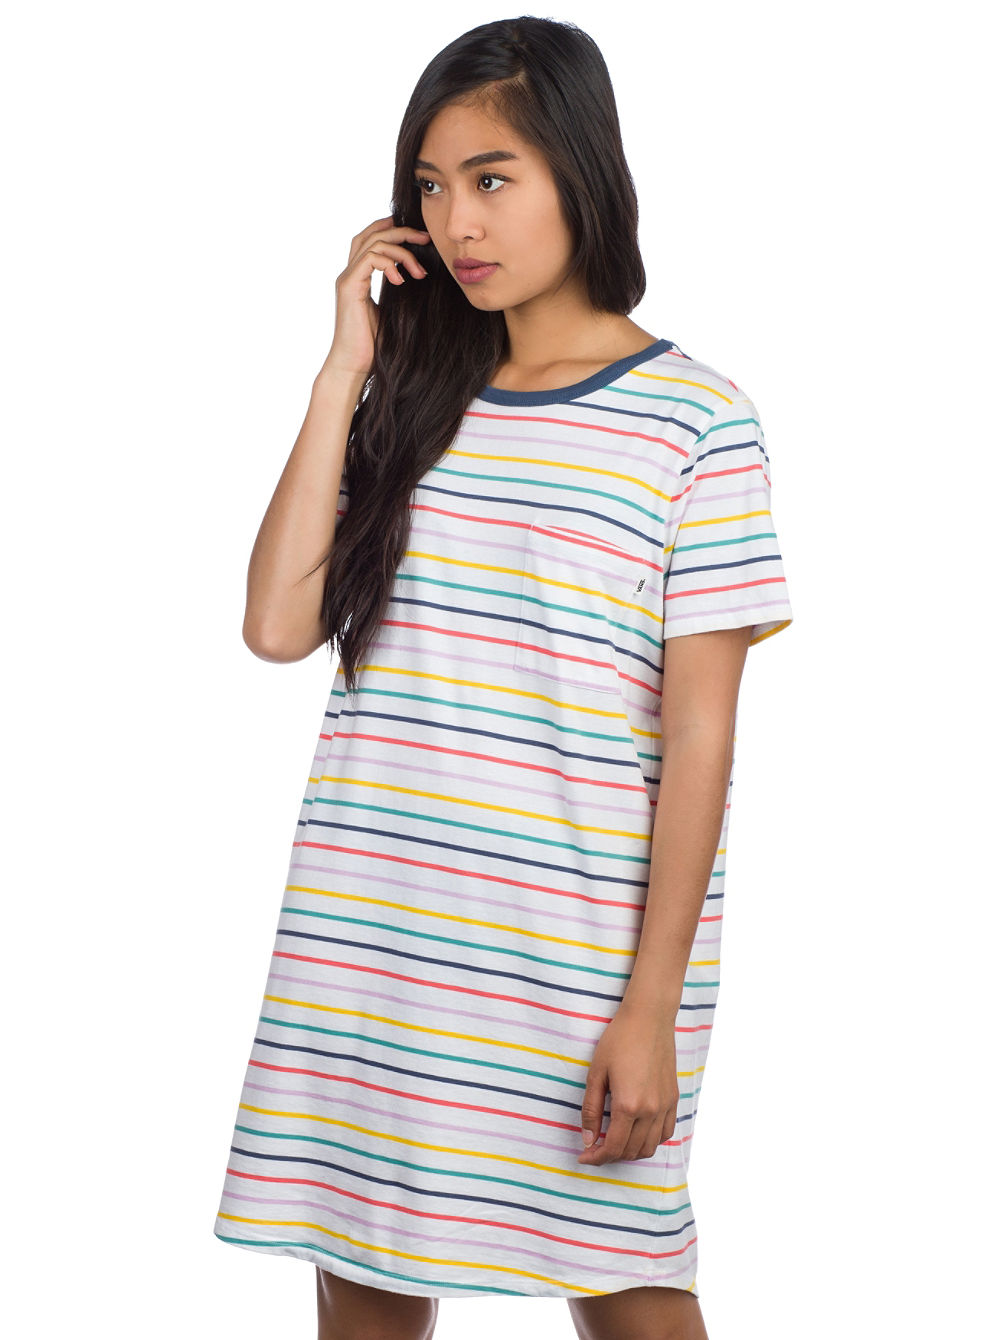 dc43d763c4 Buy Vans Pool Party Dress online at Blue Tomato